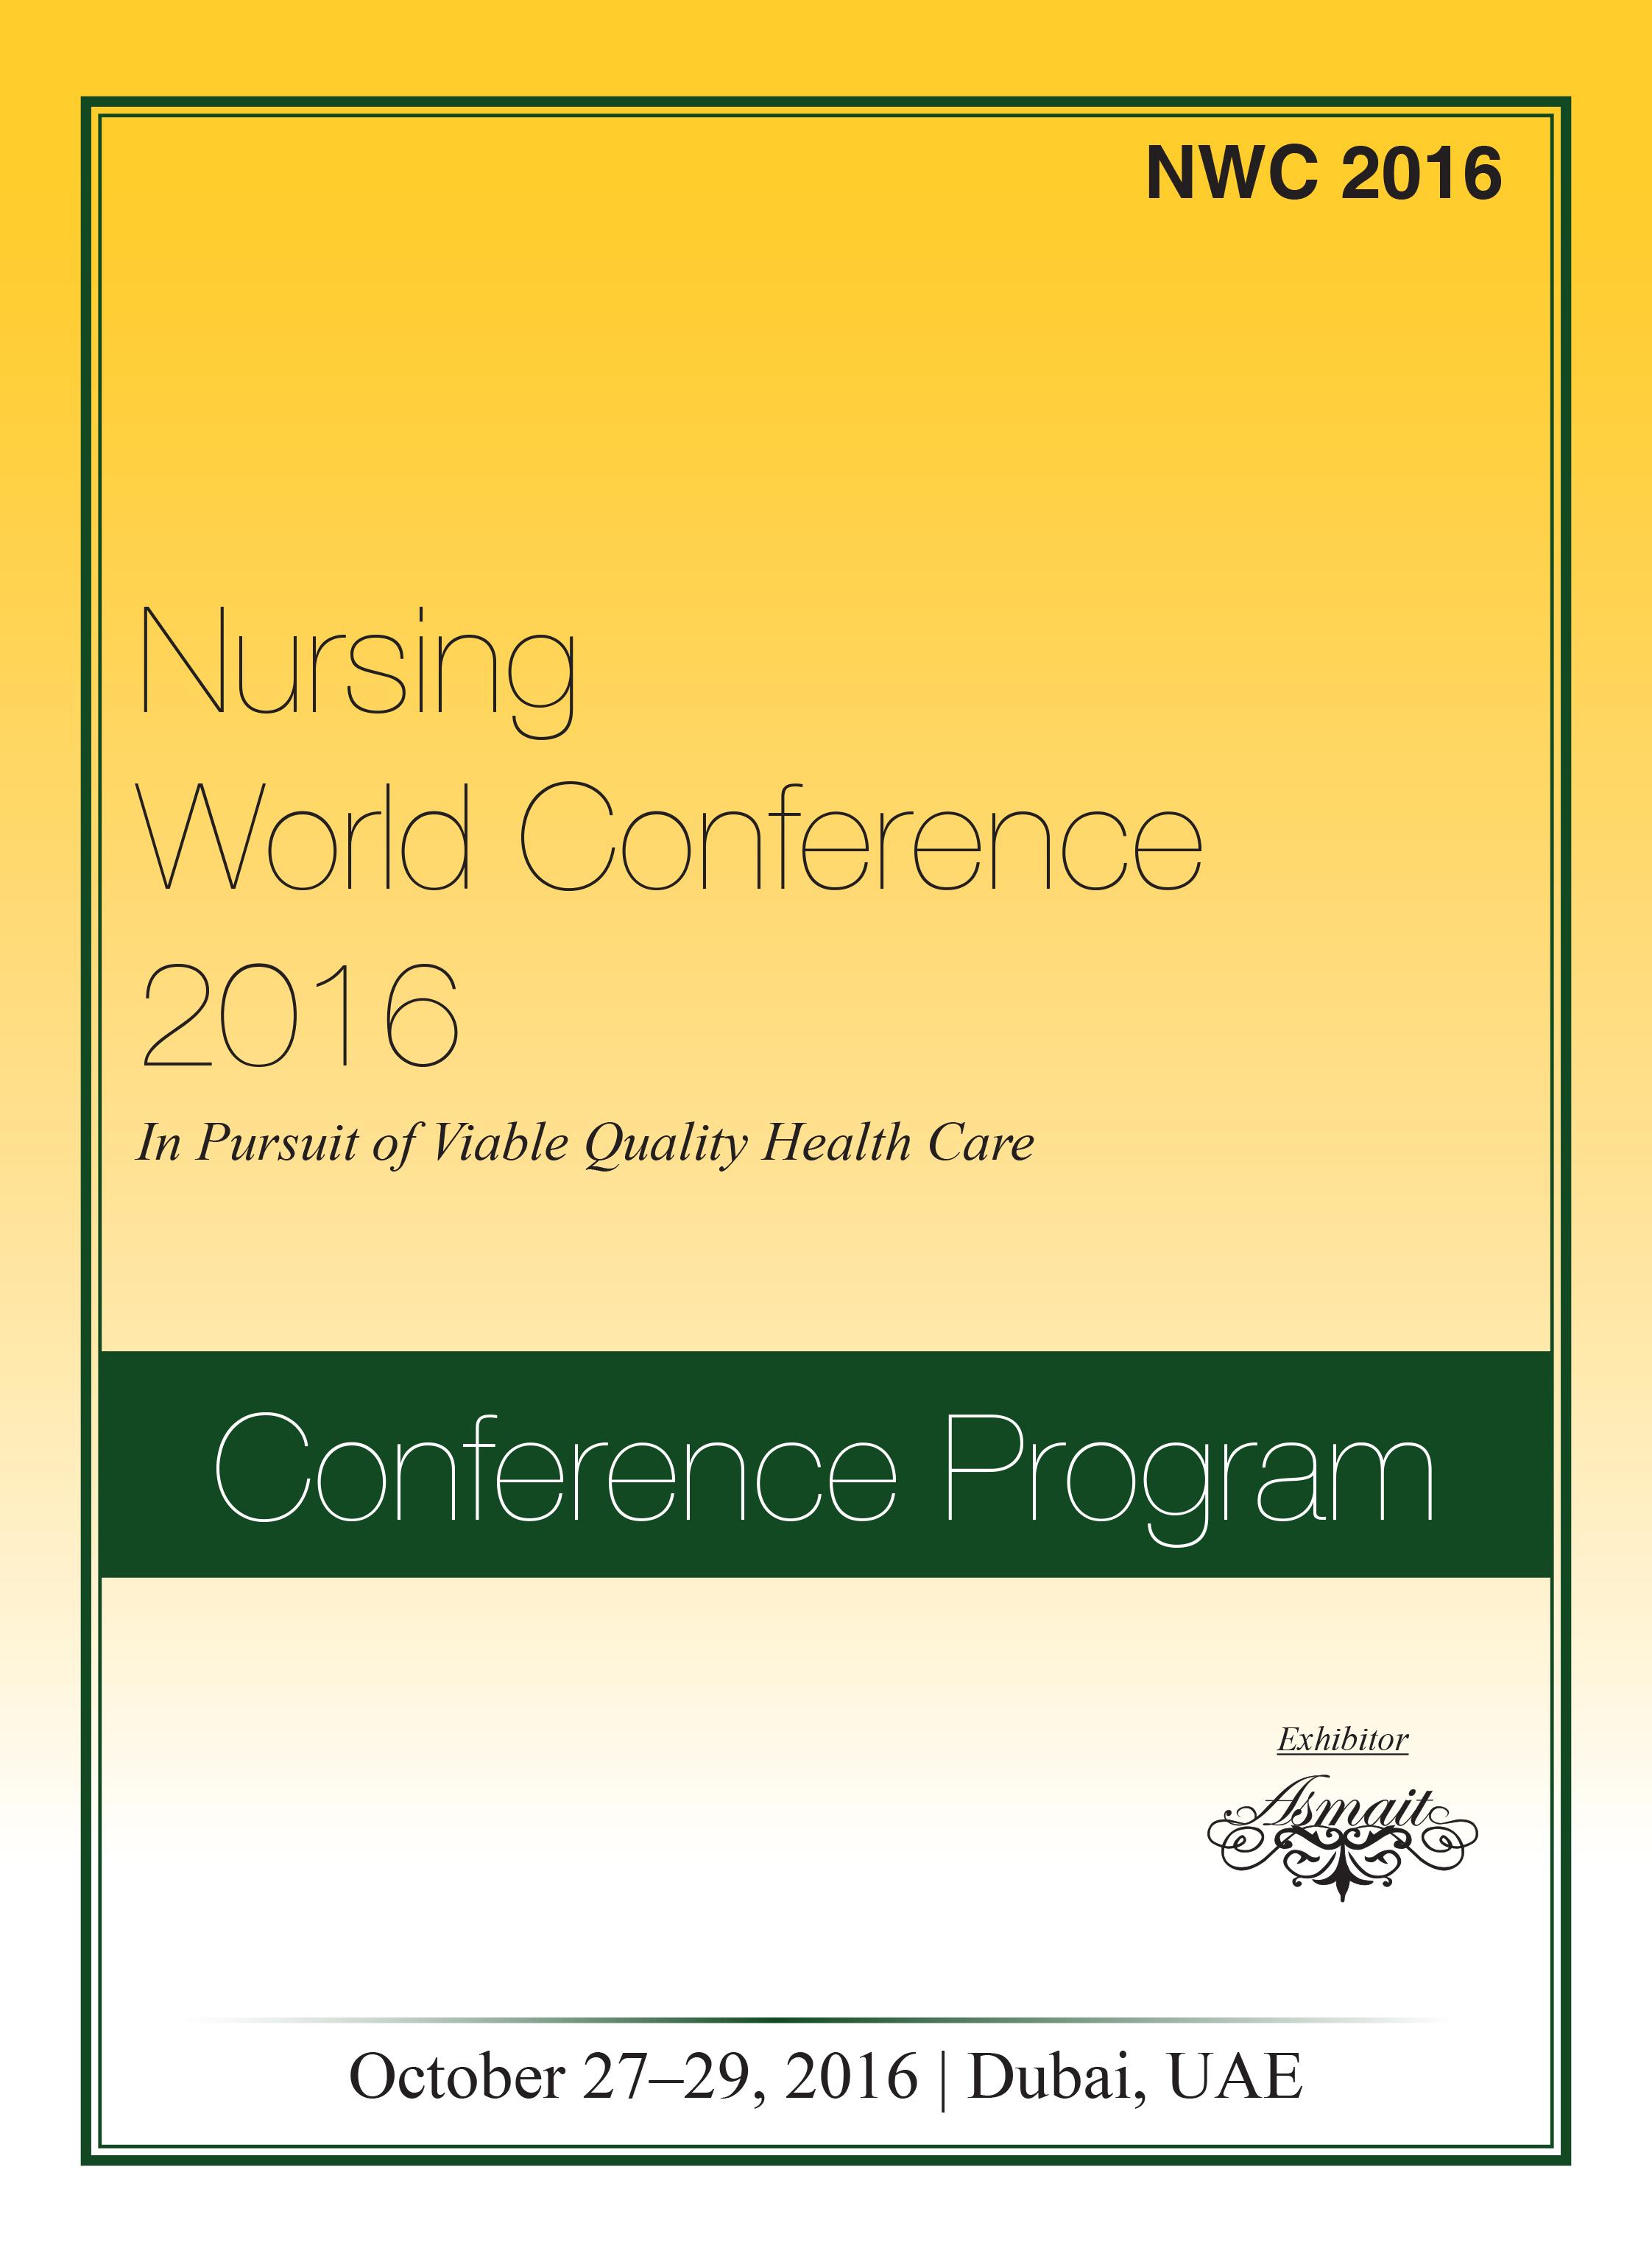 Nursing World Conference | Dubai, UAE Program